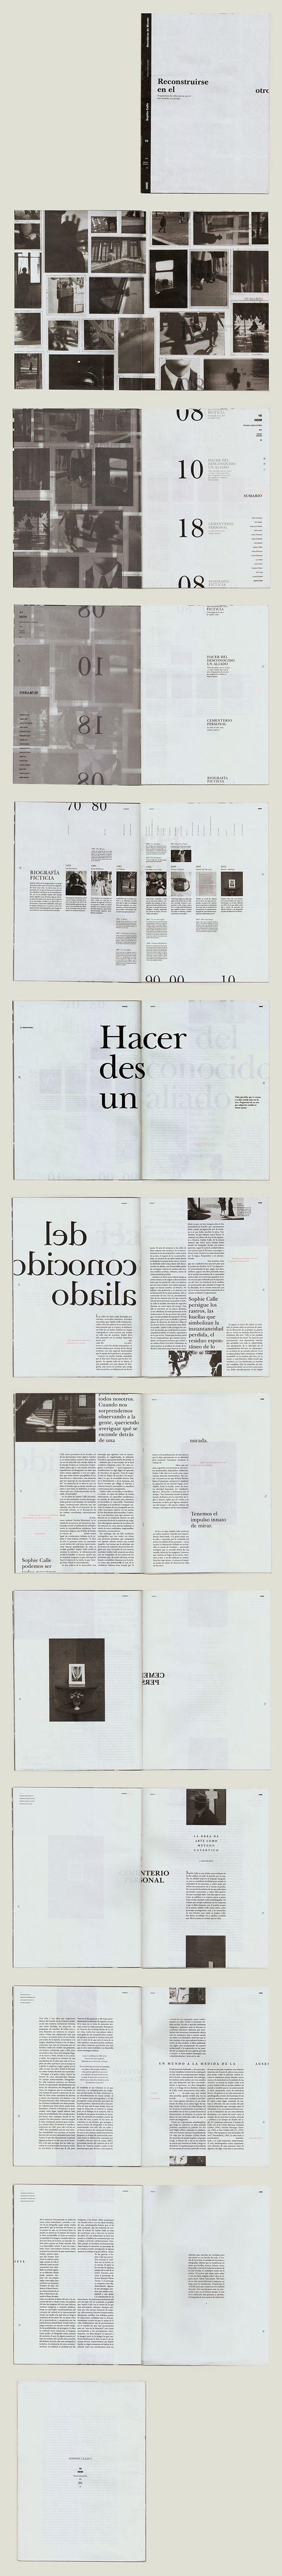 Fascículo Coleccionable. Sophie Calle.DG 2, Cátedra Gabriele, 2014.FADU, UBA.